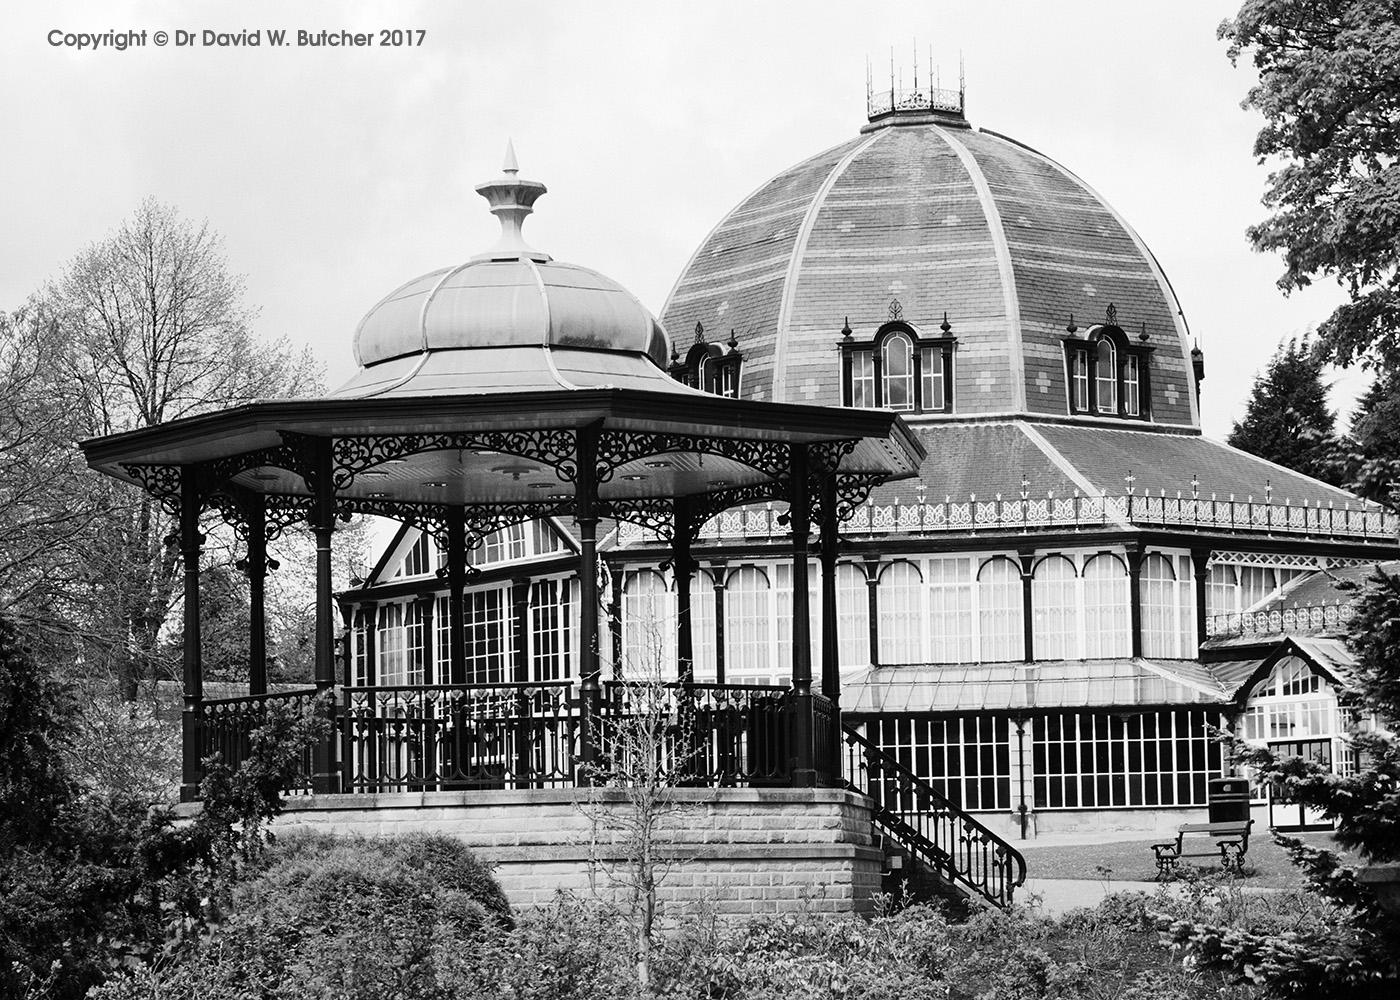 Buxton Pavilion Gardens Bandstand and Octagon, Peak District